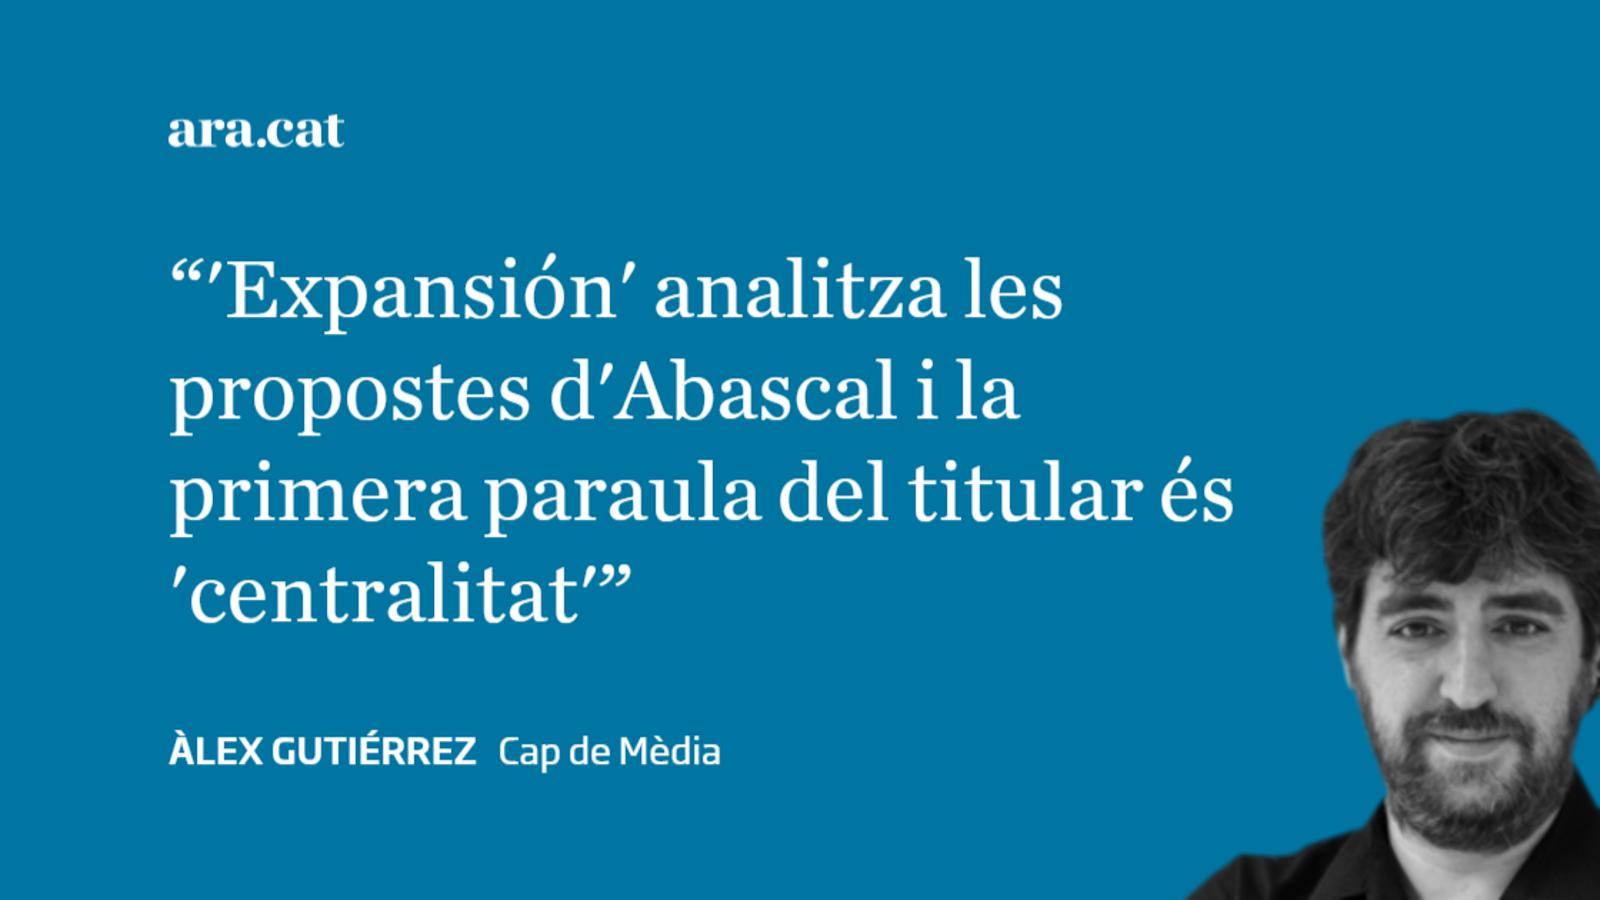 El diner espanyol situa Santiago Abascal al centre